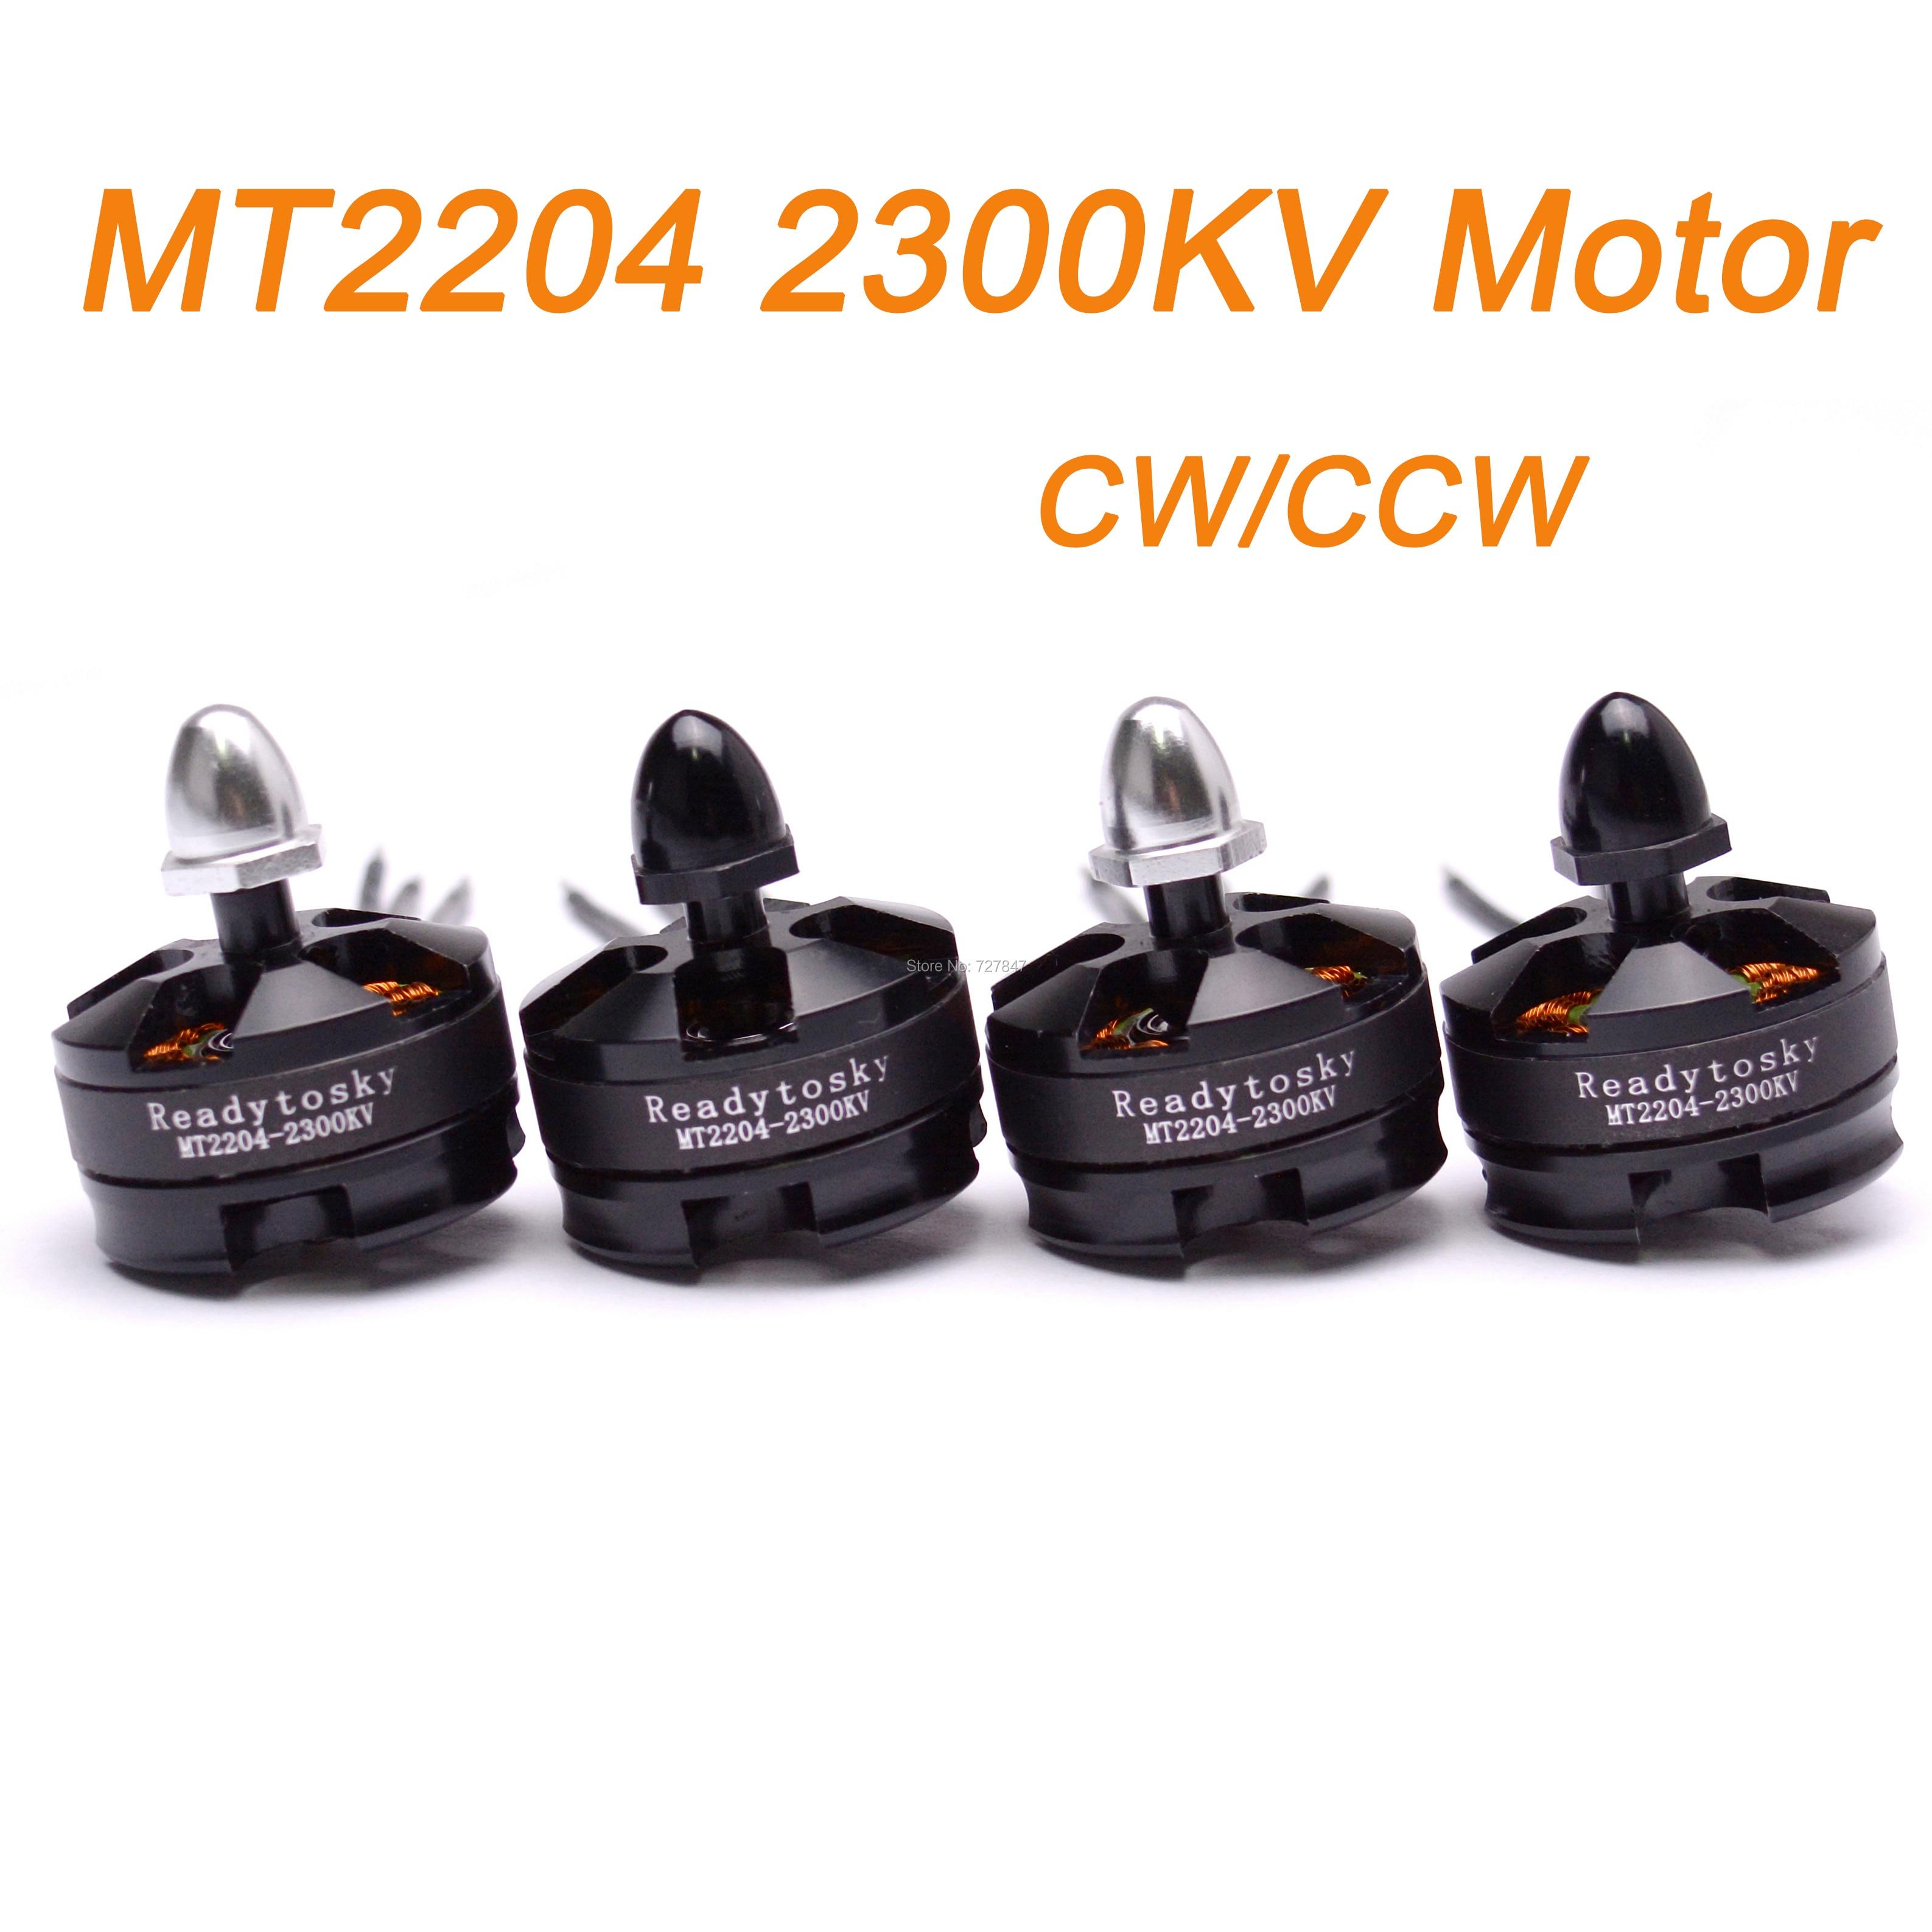 Бесщеточный двигатель CW / CCW MT2204 2204 2300KV, Квадрокоптер 250 QAV250 для Mini 210 250 280 мм, четыре оси, FPV|motor quadcopter|quadcopter 250brushless motor quadcopter | АлиЭкспресс - Electronics